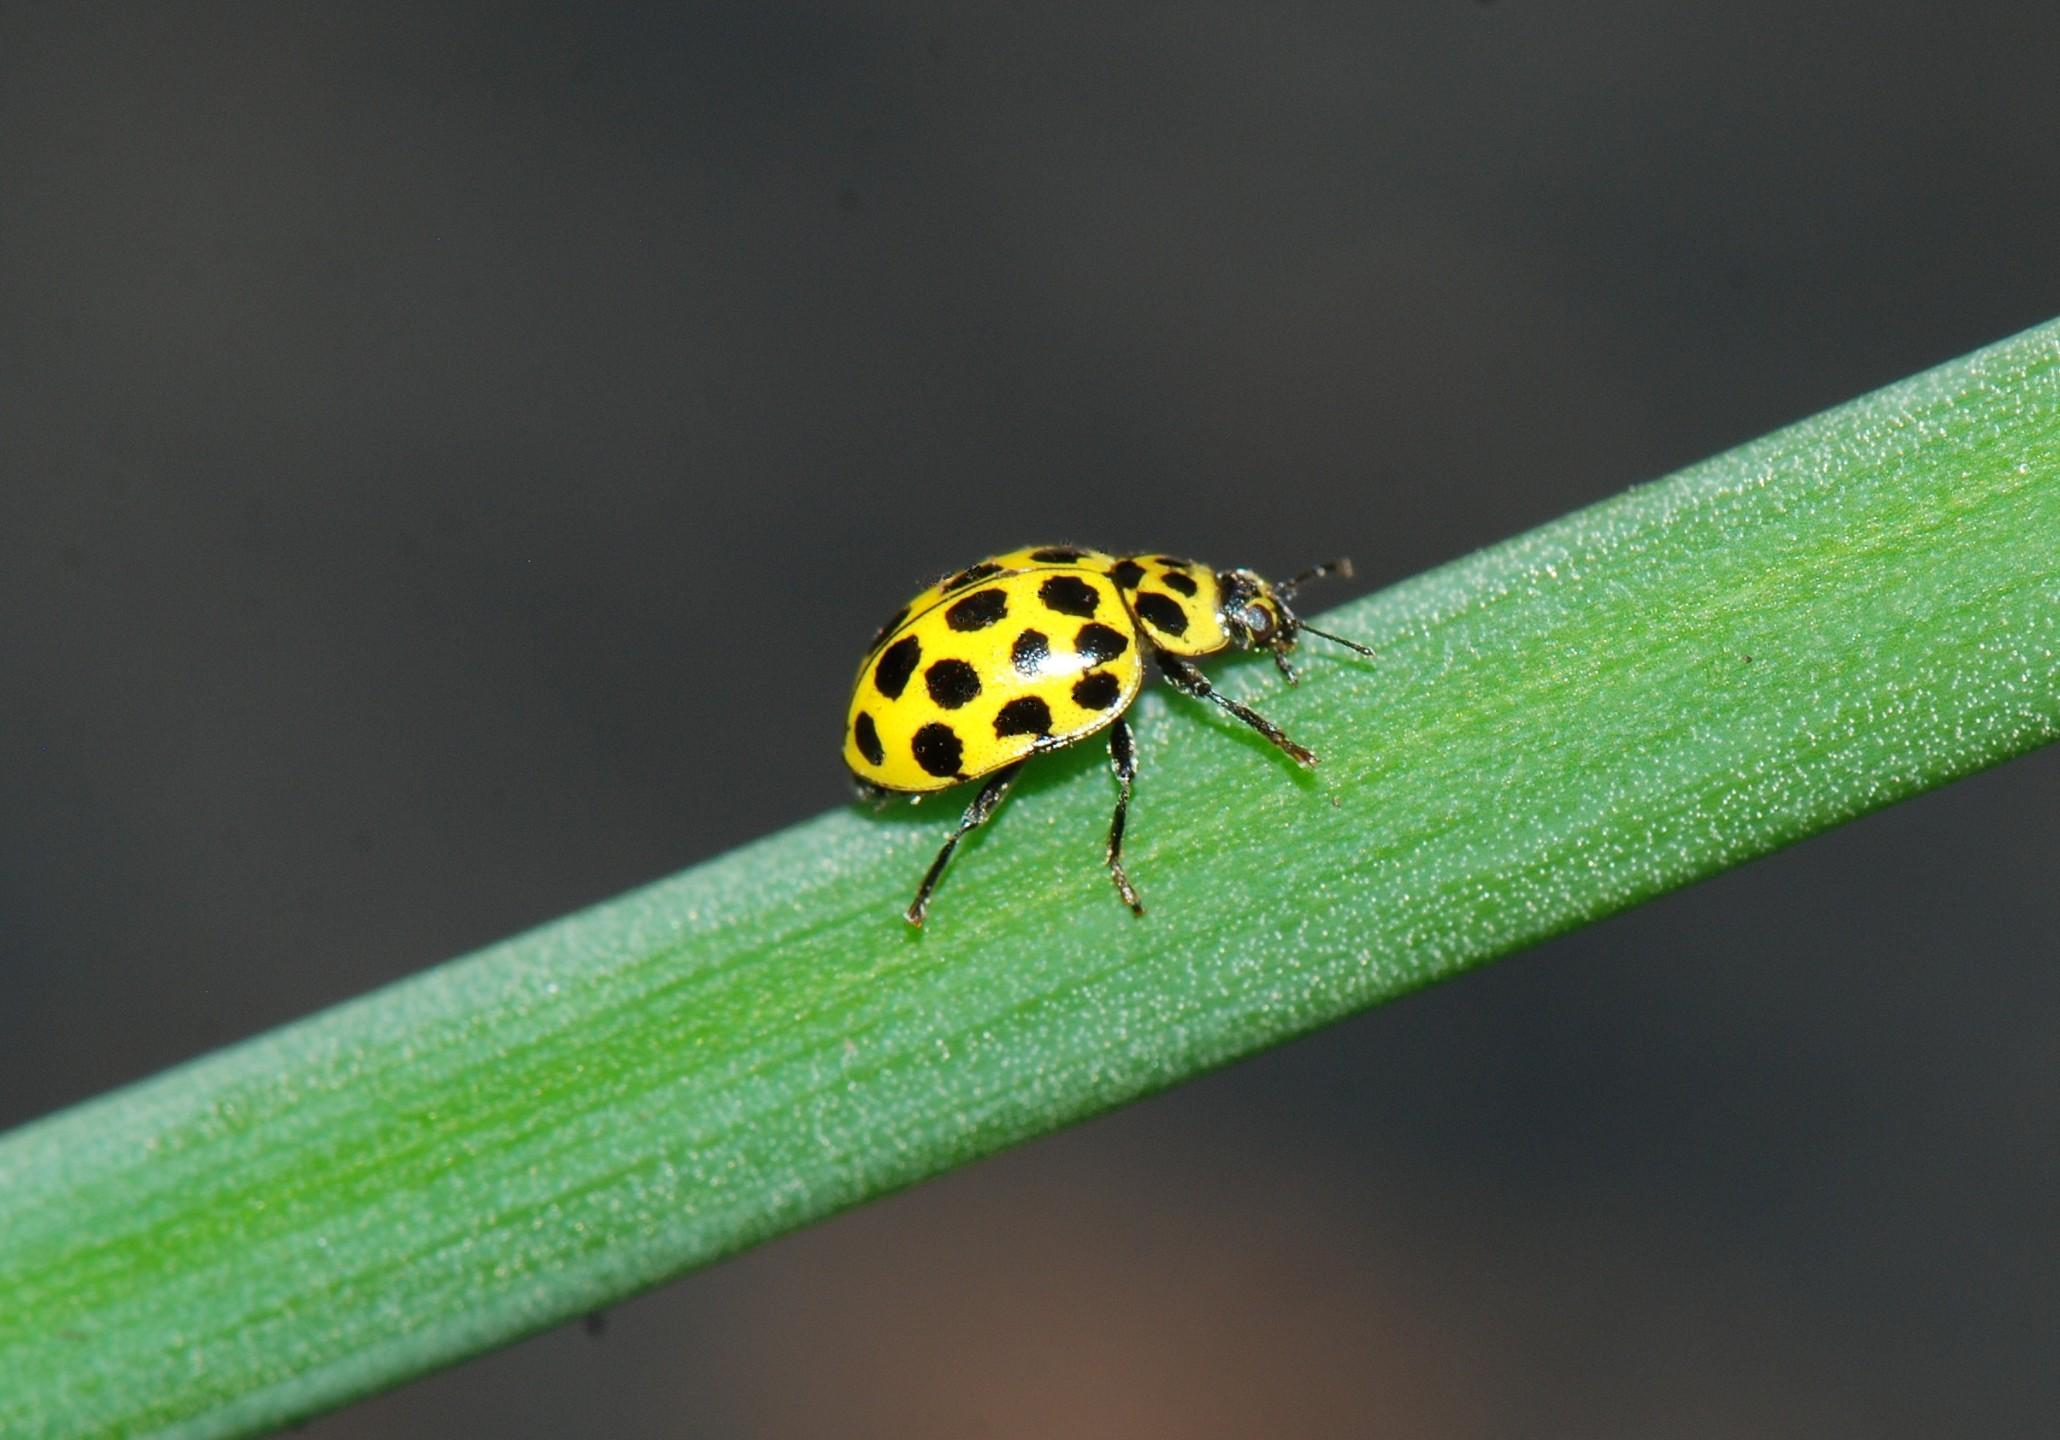 The Twenty-two spot Ladybird Psyllobora vigintiduopunctata